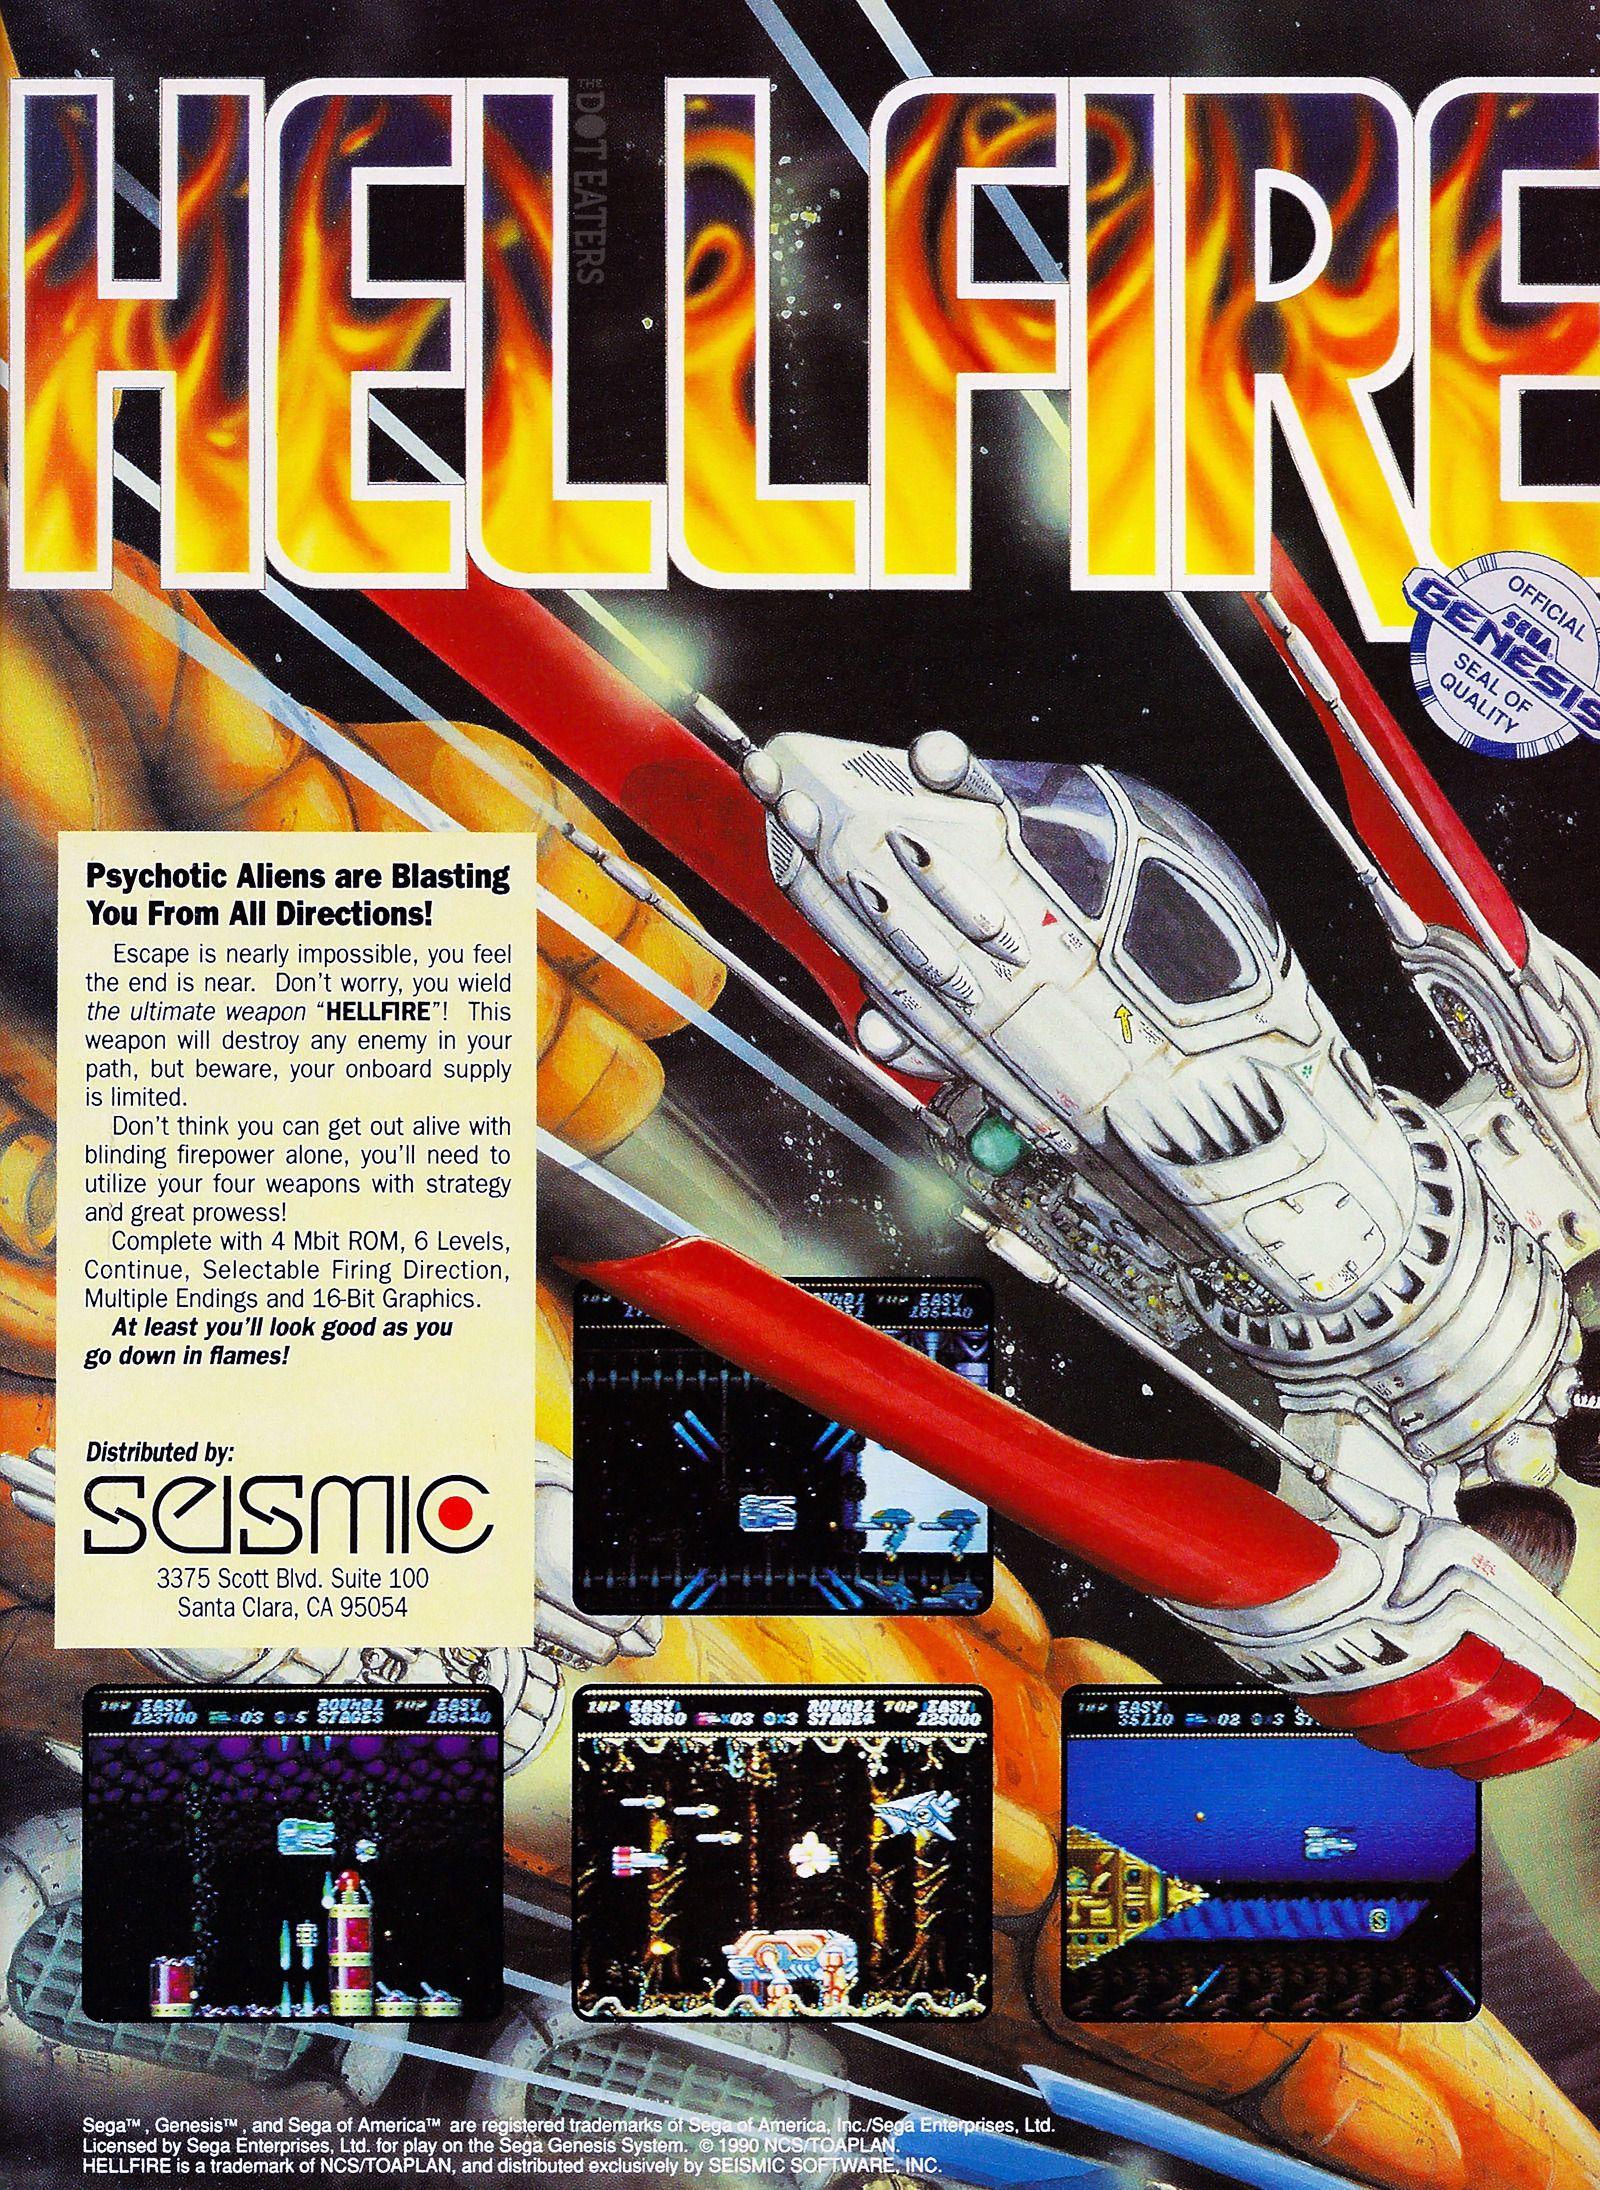 Hellfire! (1990) Genesis bitstory Retro video games